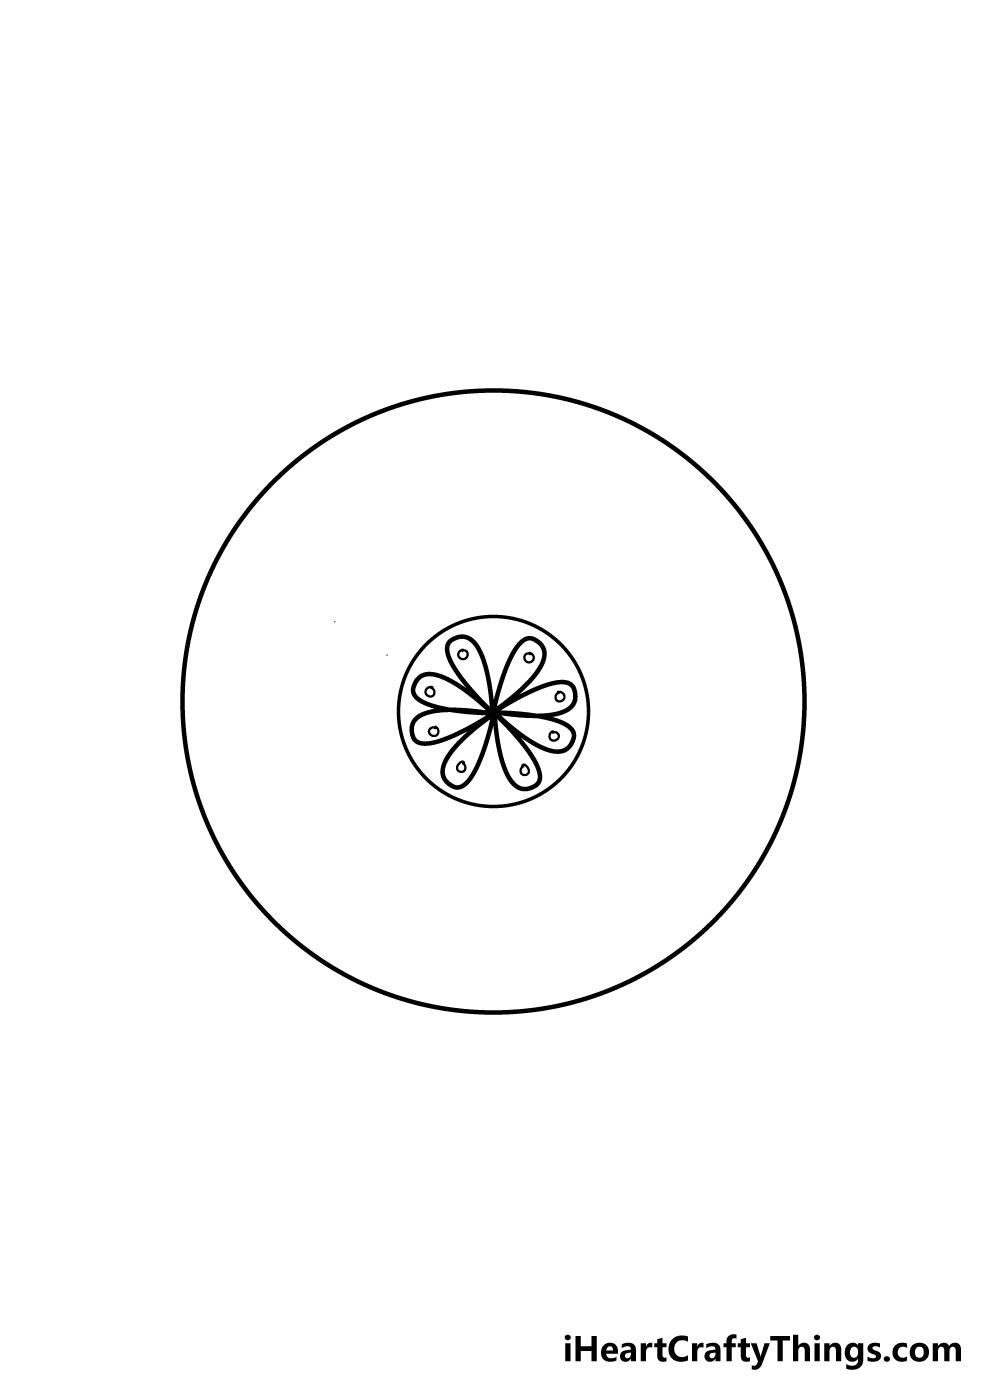 mandala drawing step 3